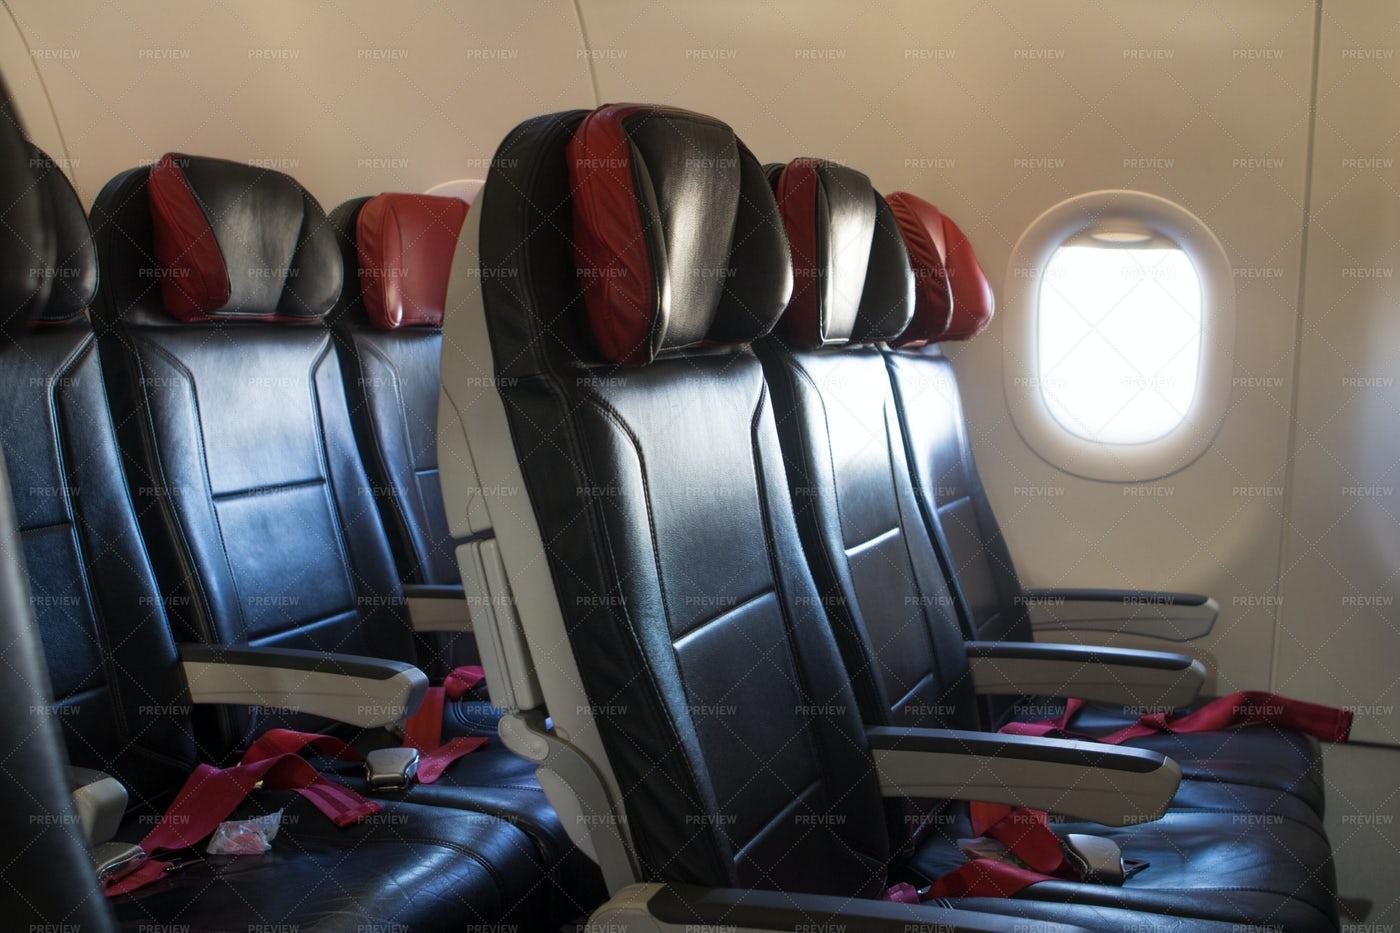 Empty Seats Inside An Airplane: Stock Photos